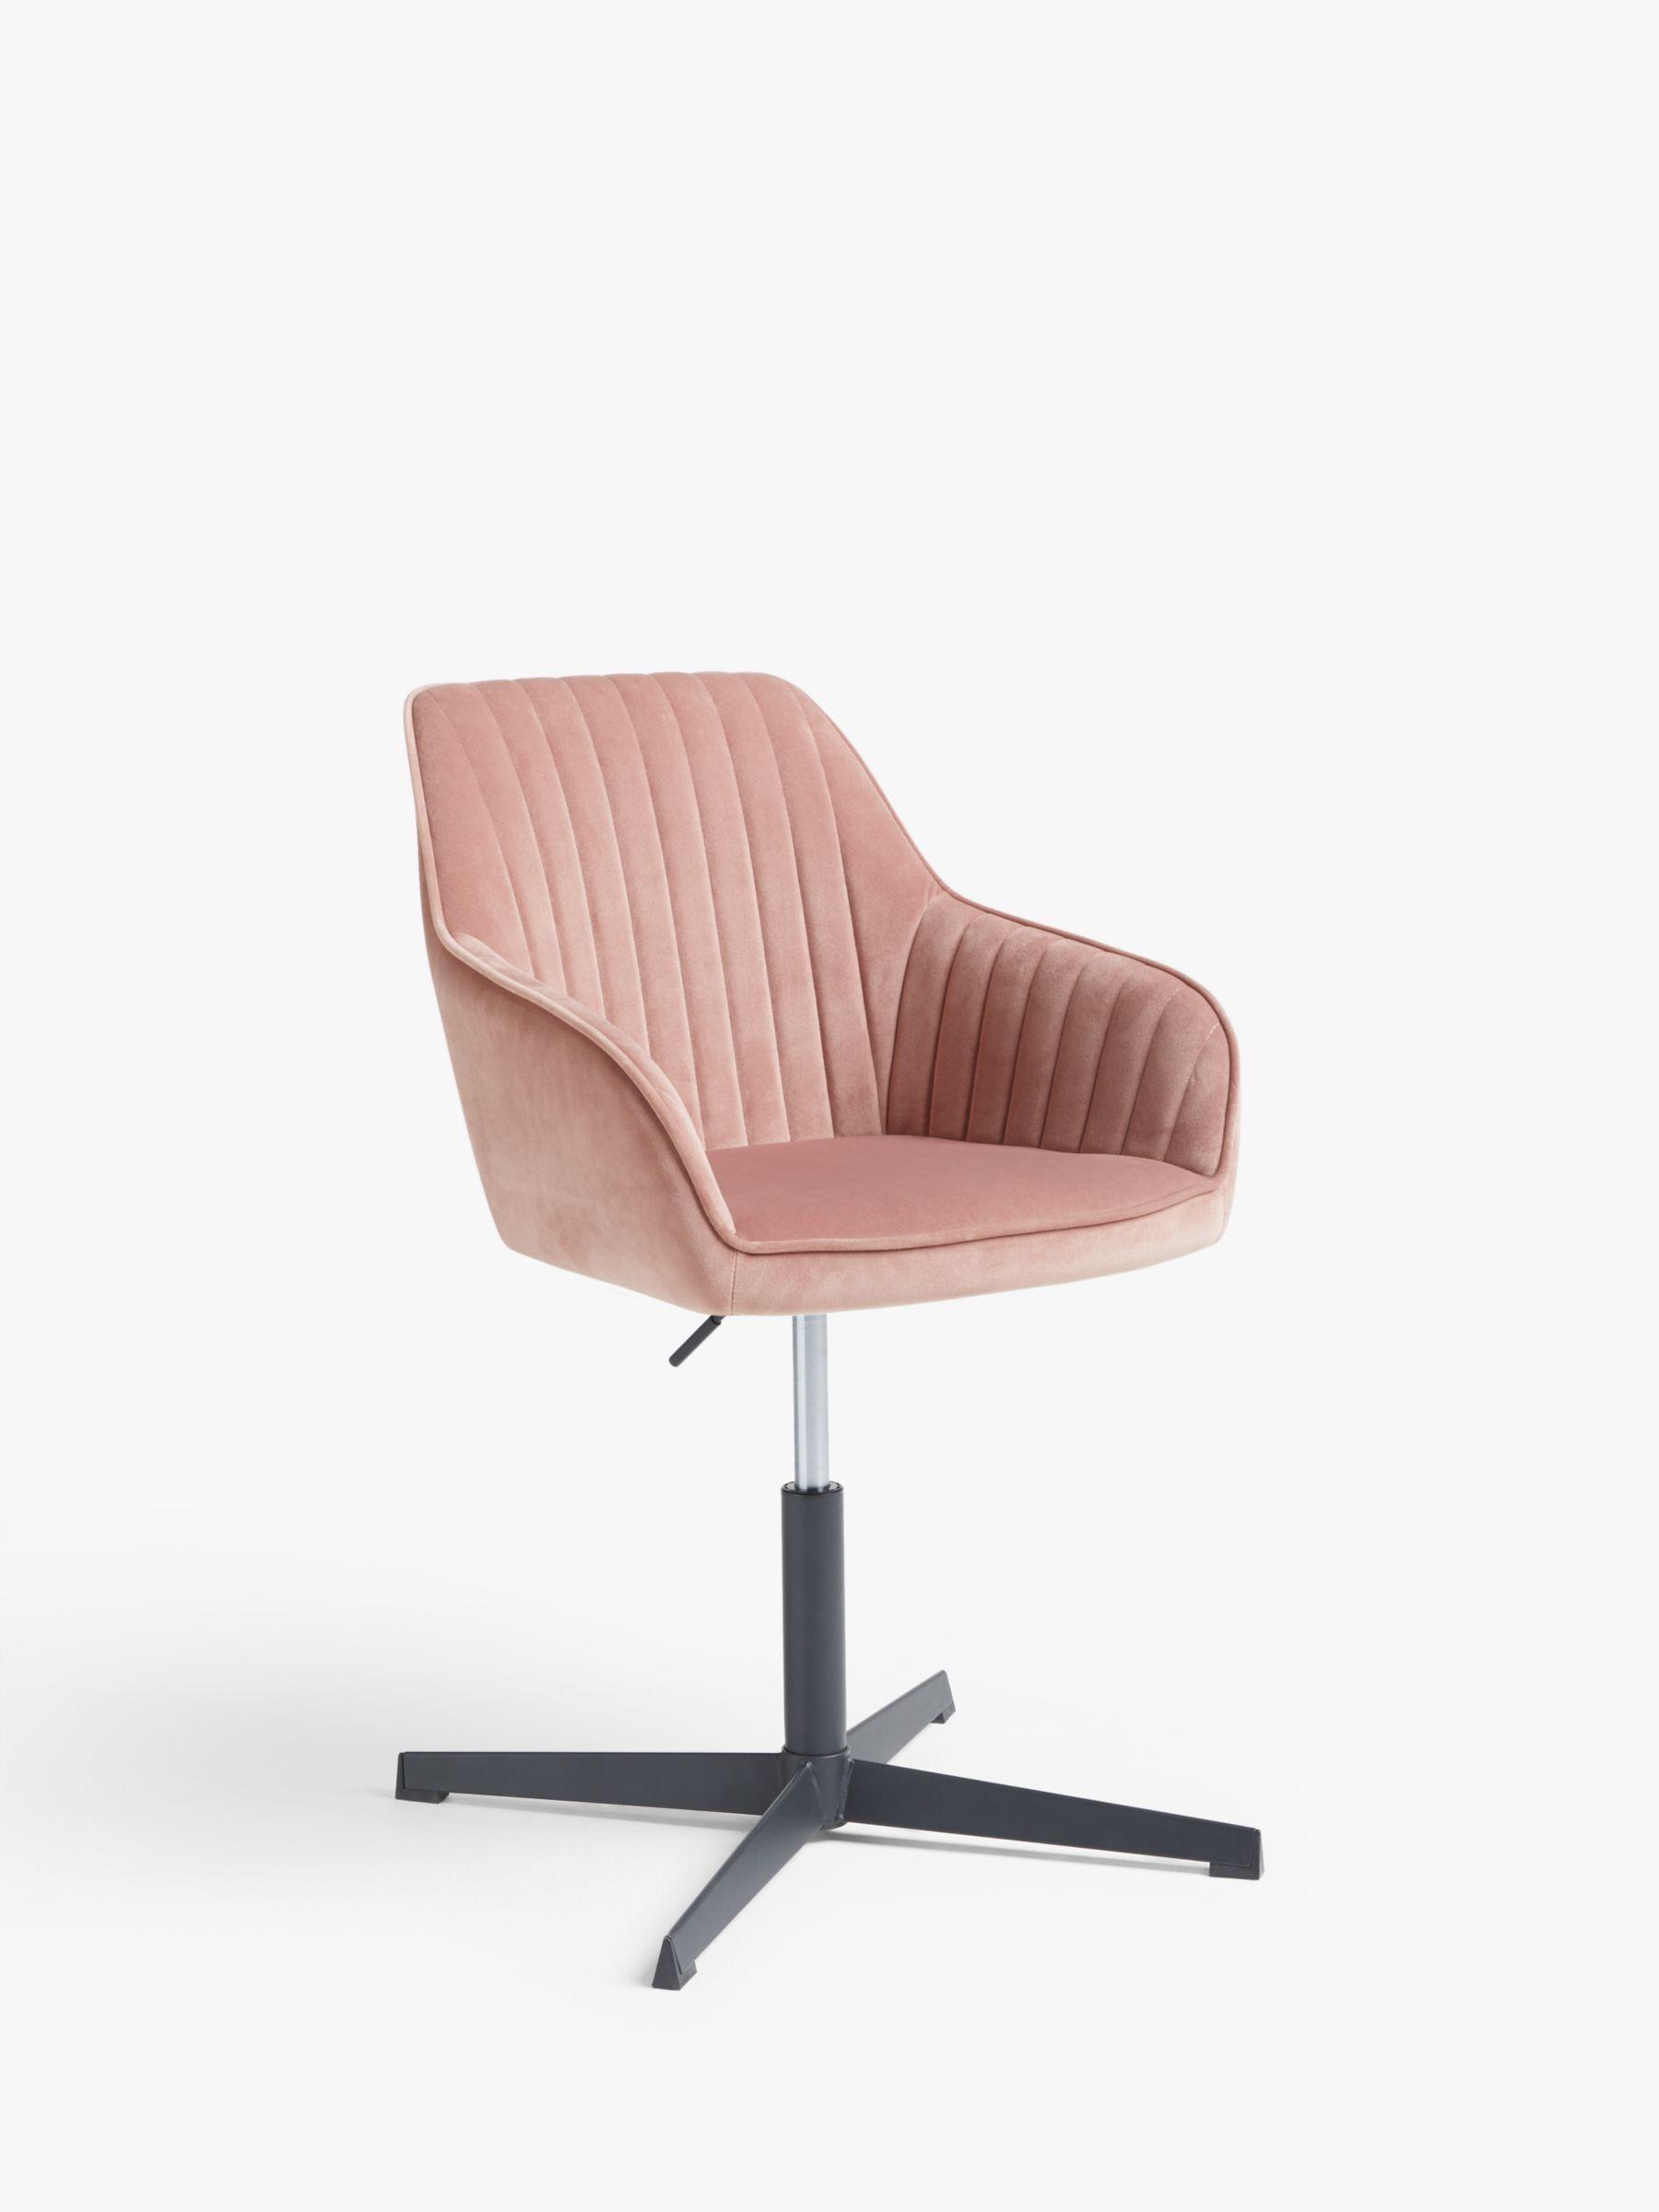 Modern Desk Chairs No Wheels Off 56, Modern Home Office Chair No Wheels